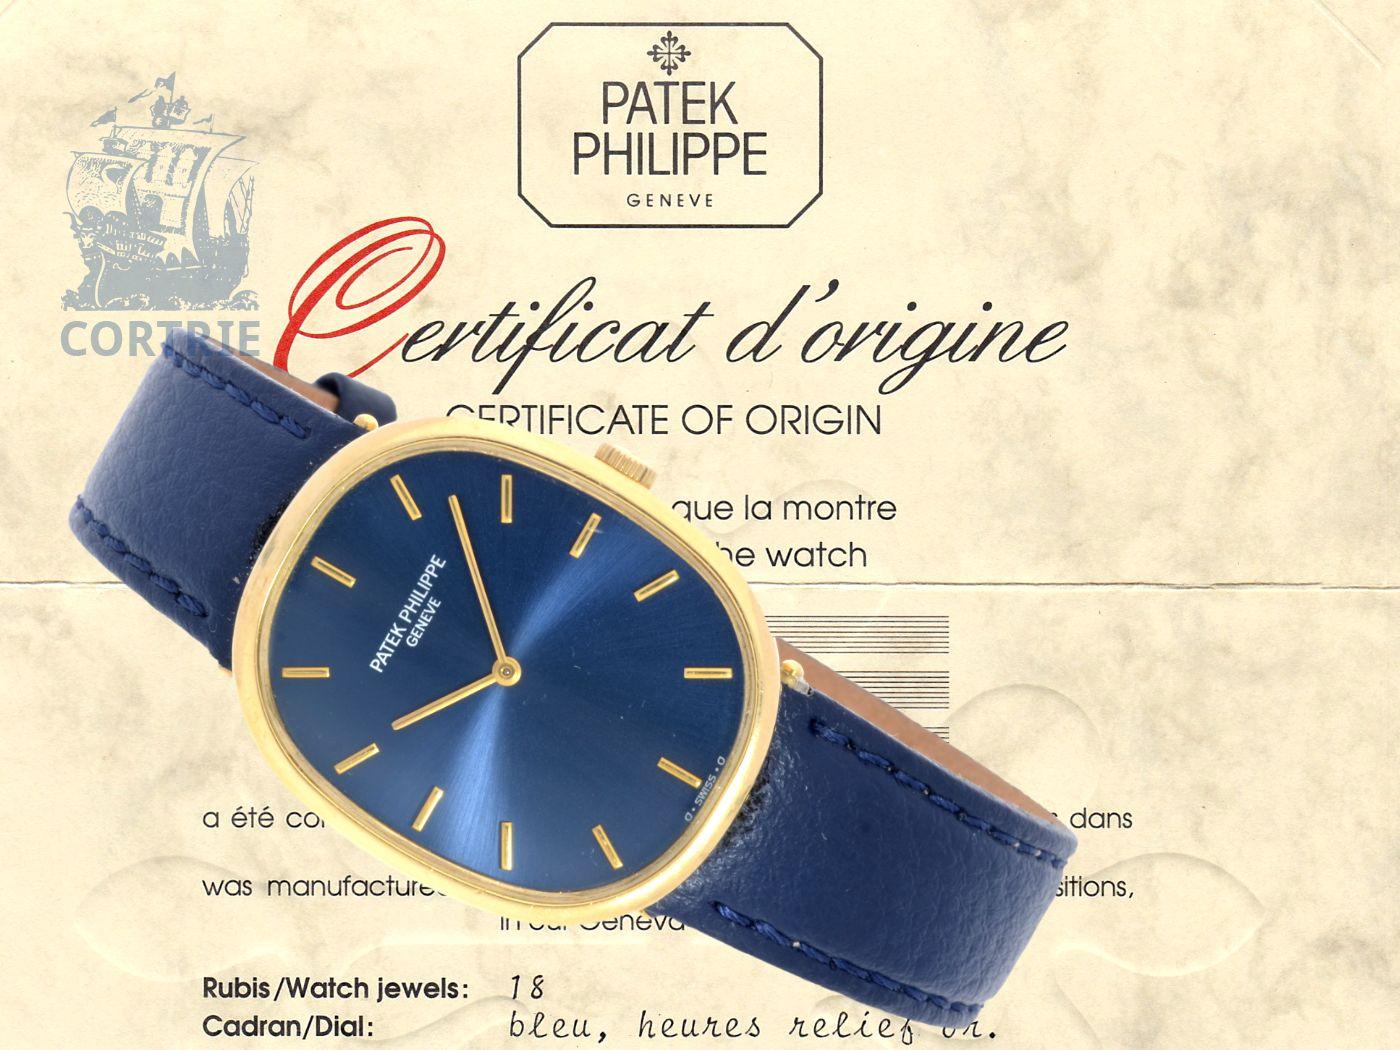 Wristwatch: very fine Patek Philippe Ellipse gentlemen's watch with original certificate, reference 3848-